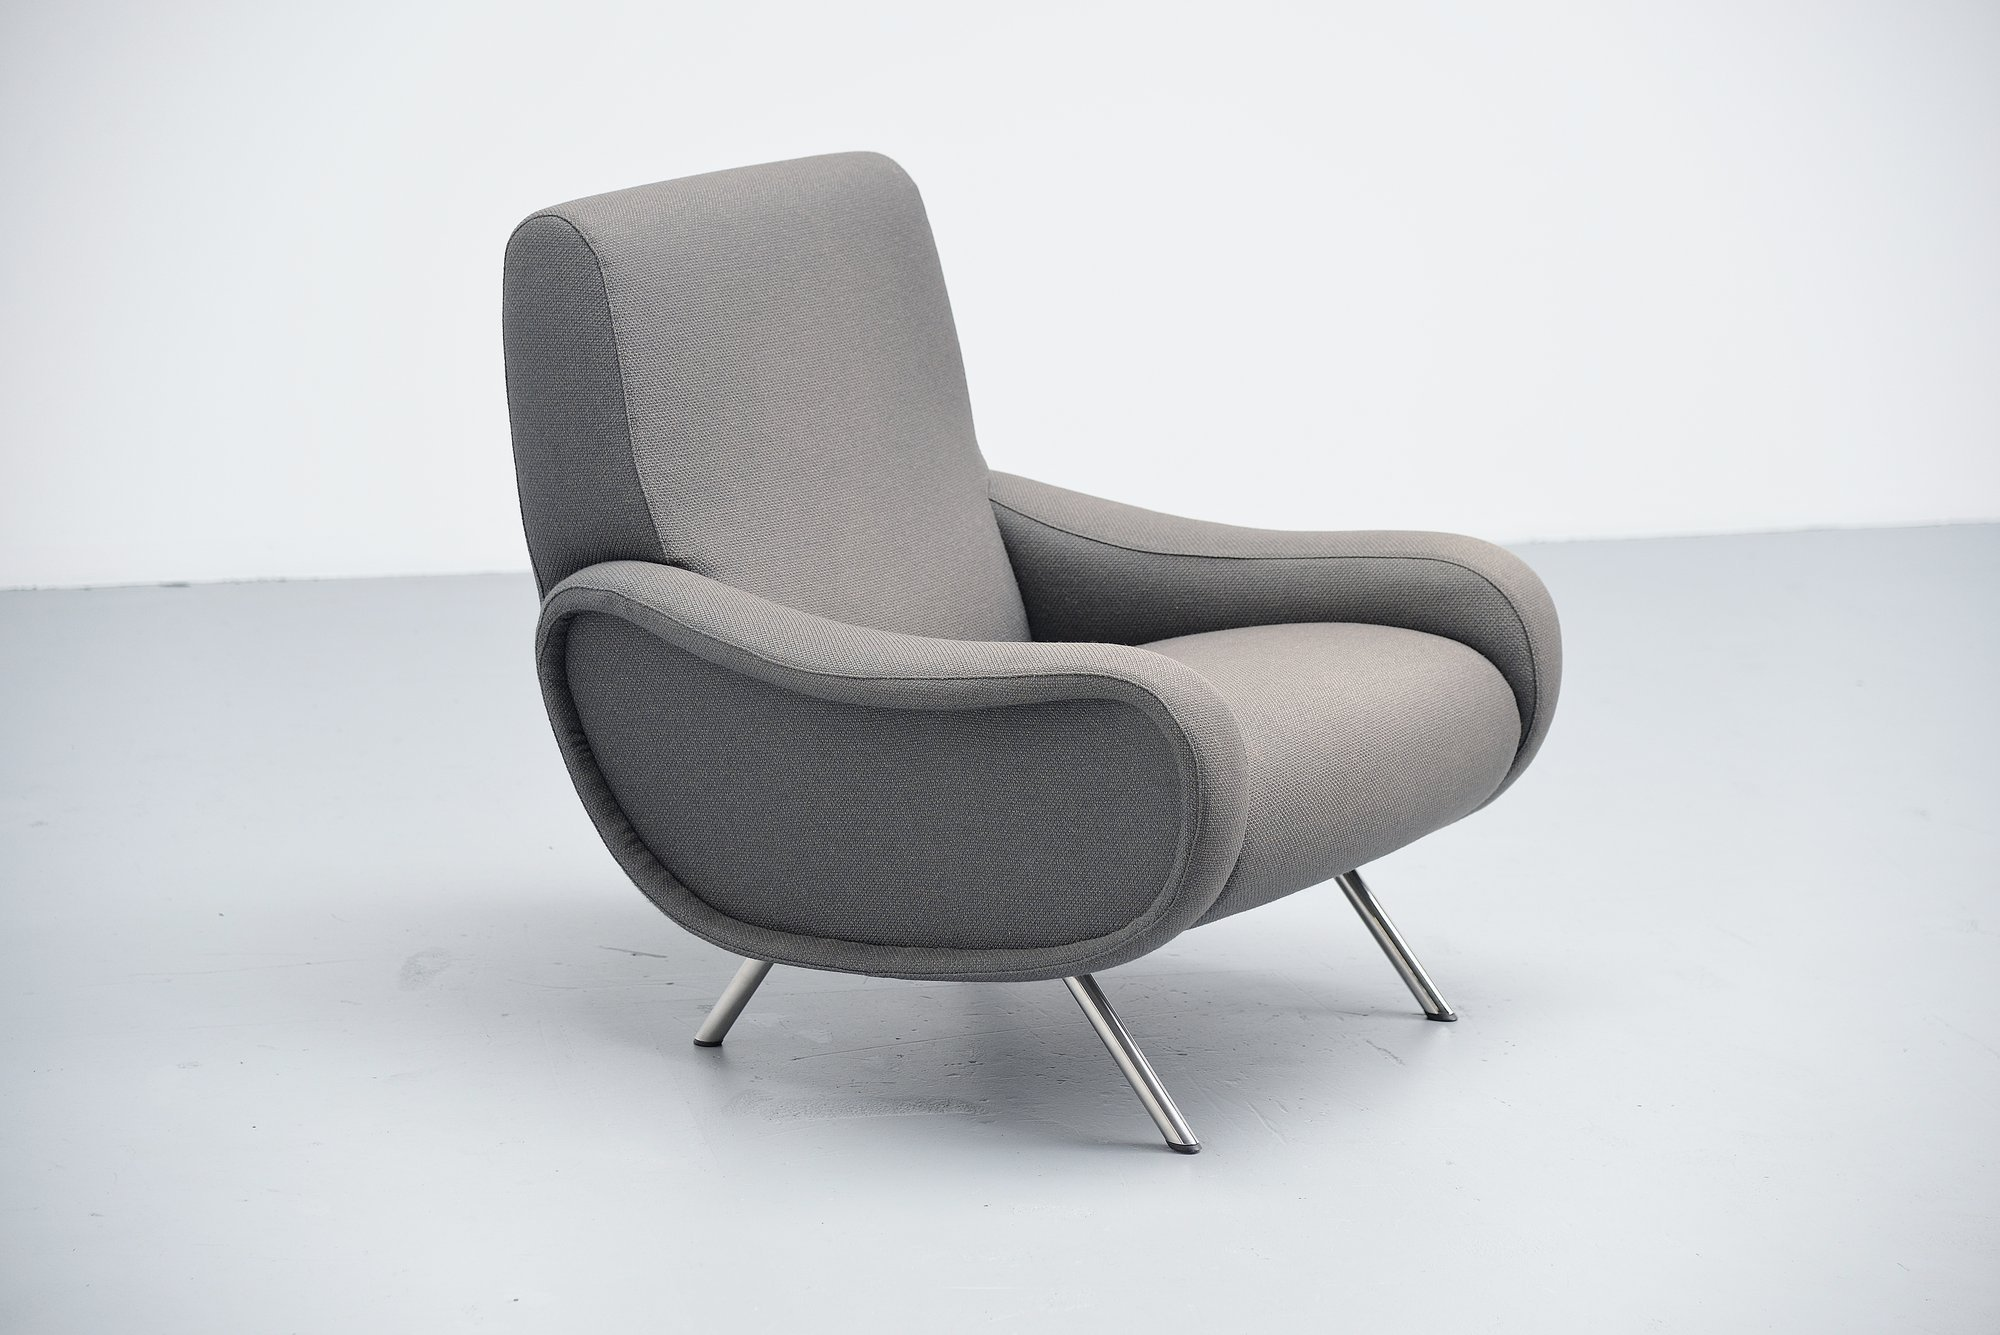 grey upholstered chair white legs chiavari chairs wedding llc marco zanuso lady arflex italy 1951 – massmoderndesign